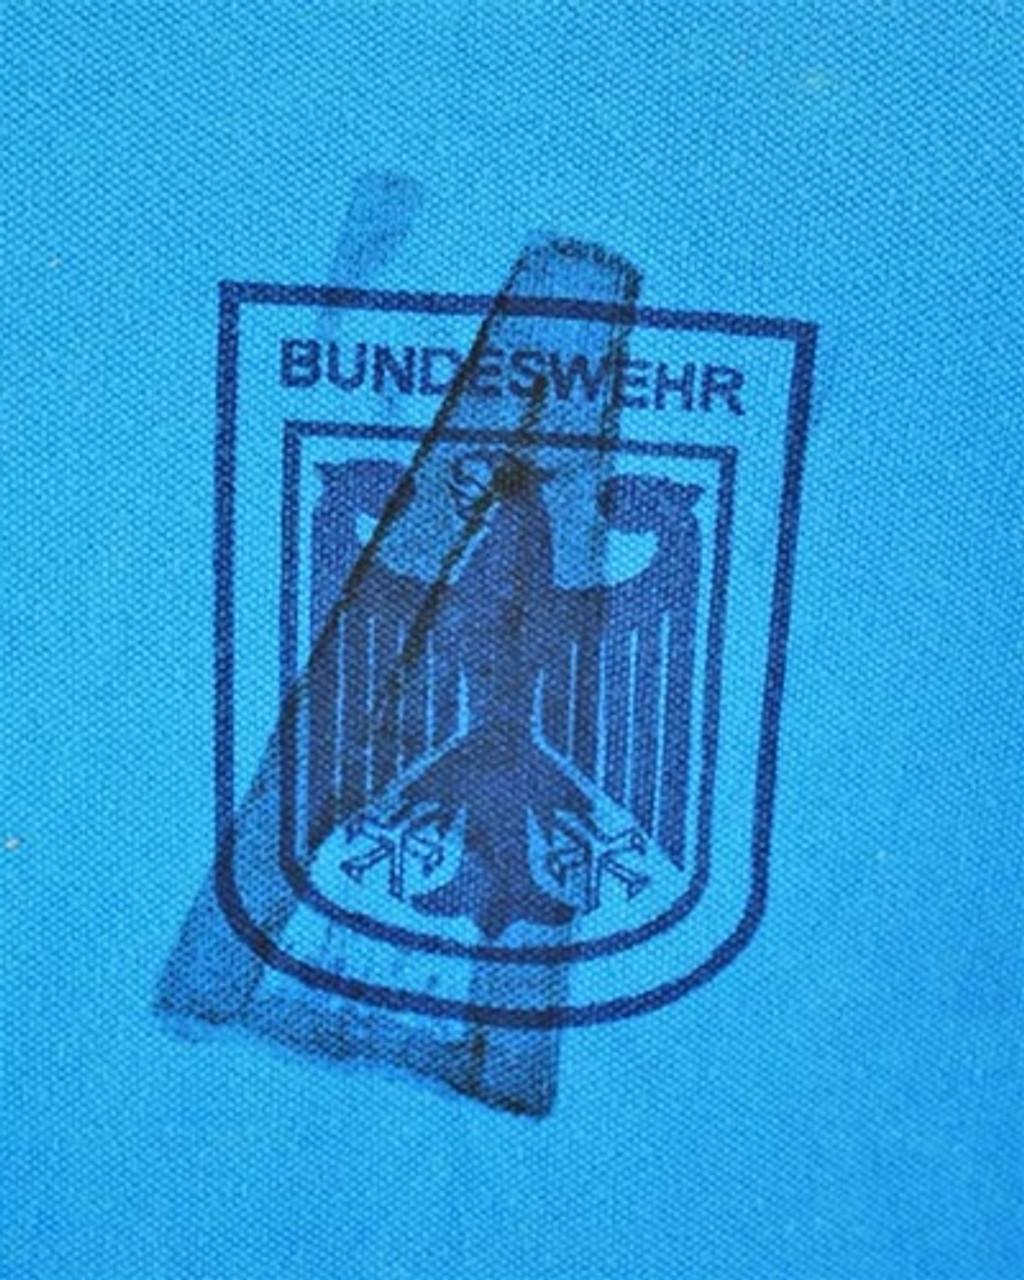 BW Blue PT Shirt from Hessen Surplus